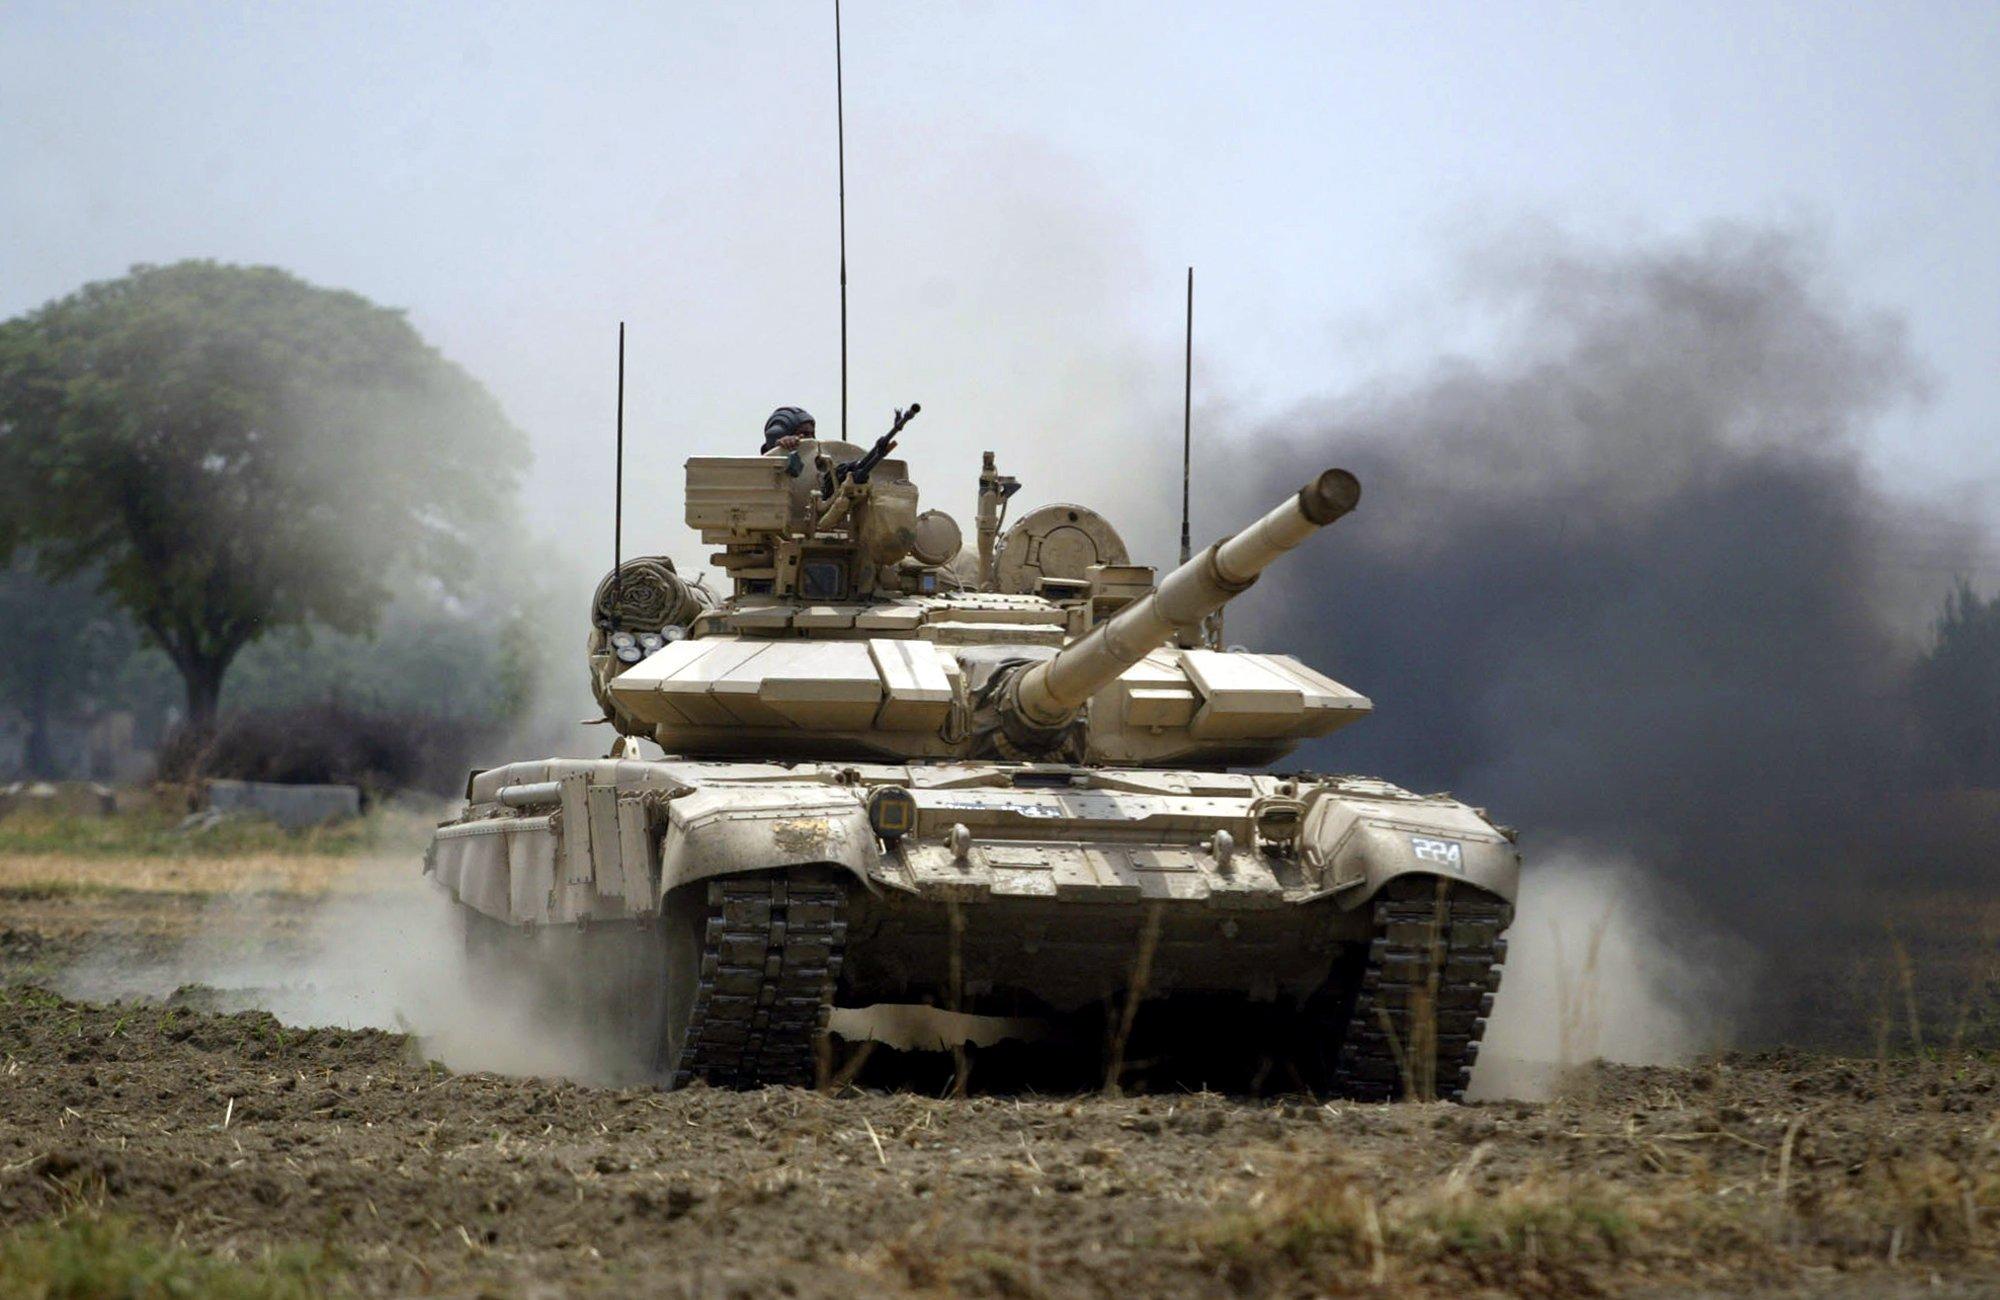 #India locally develops FSAPDS ammunition for T-72, T-90 battle tanks https://t.co/O89sK44kXa #military https://t.co/8rofNhgI2E